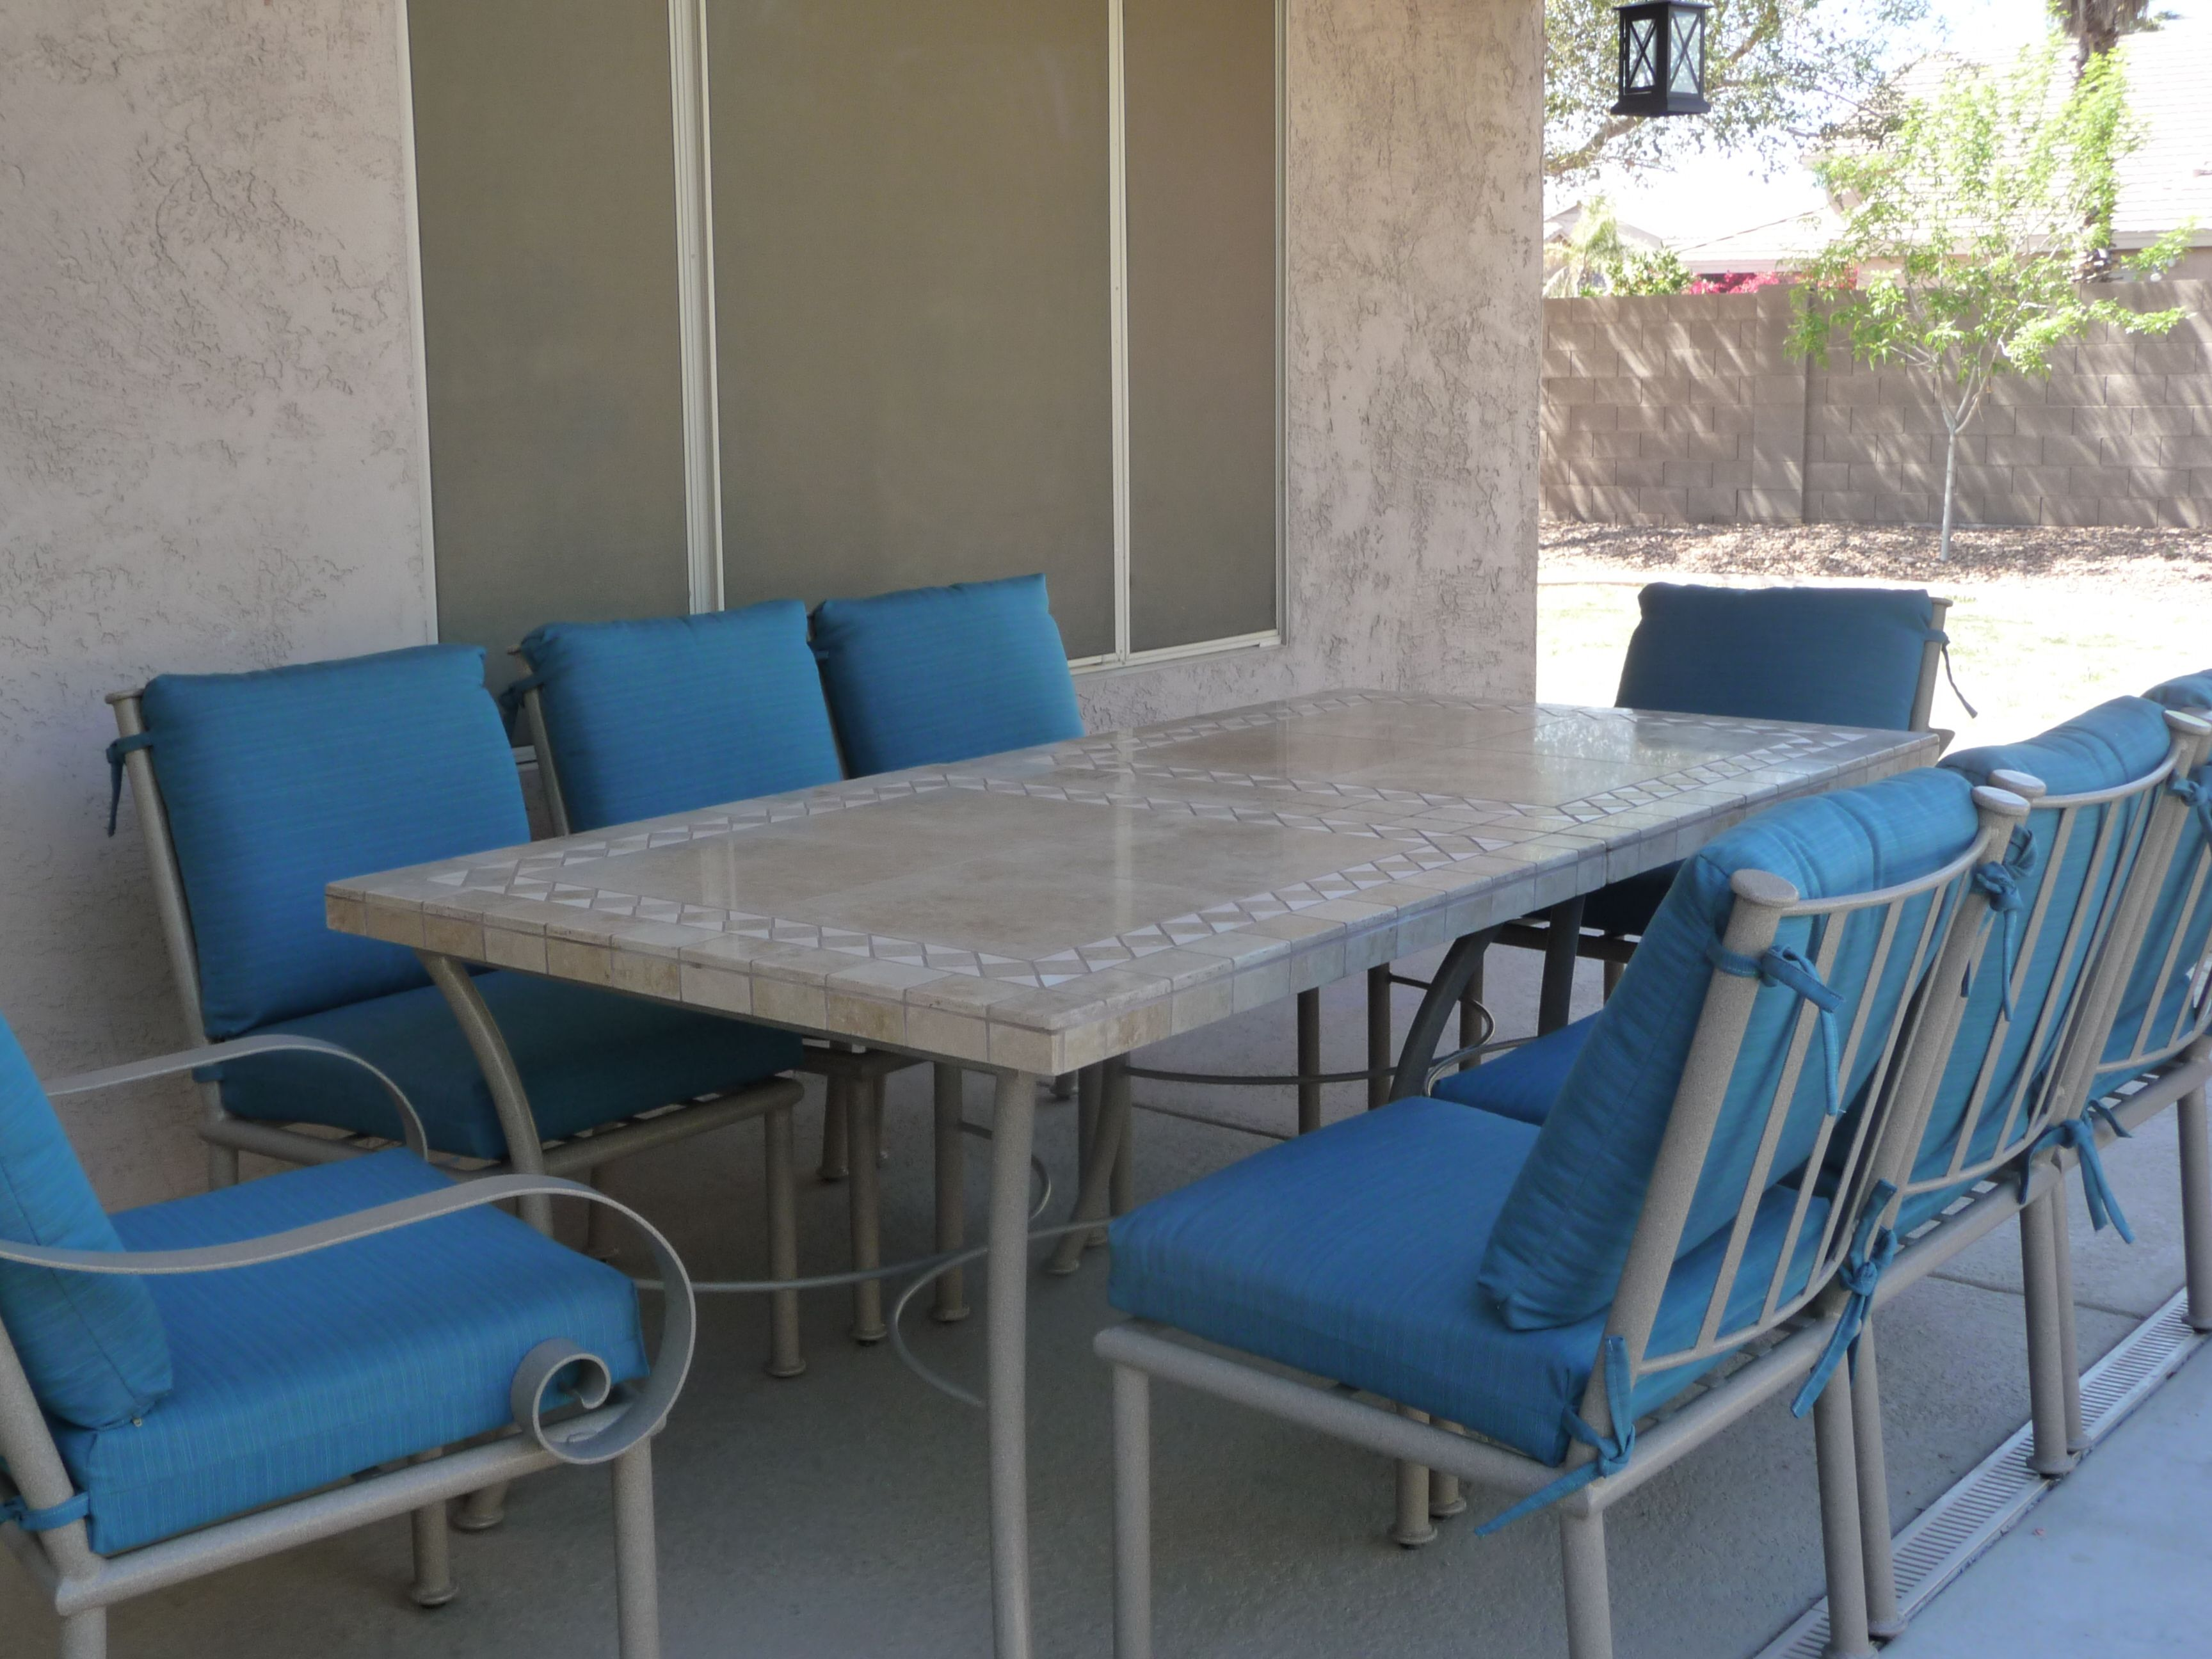 Travertine Dining Table Chairs Arizona Iron Patio Furniture Pint